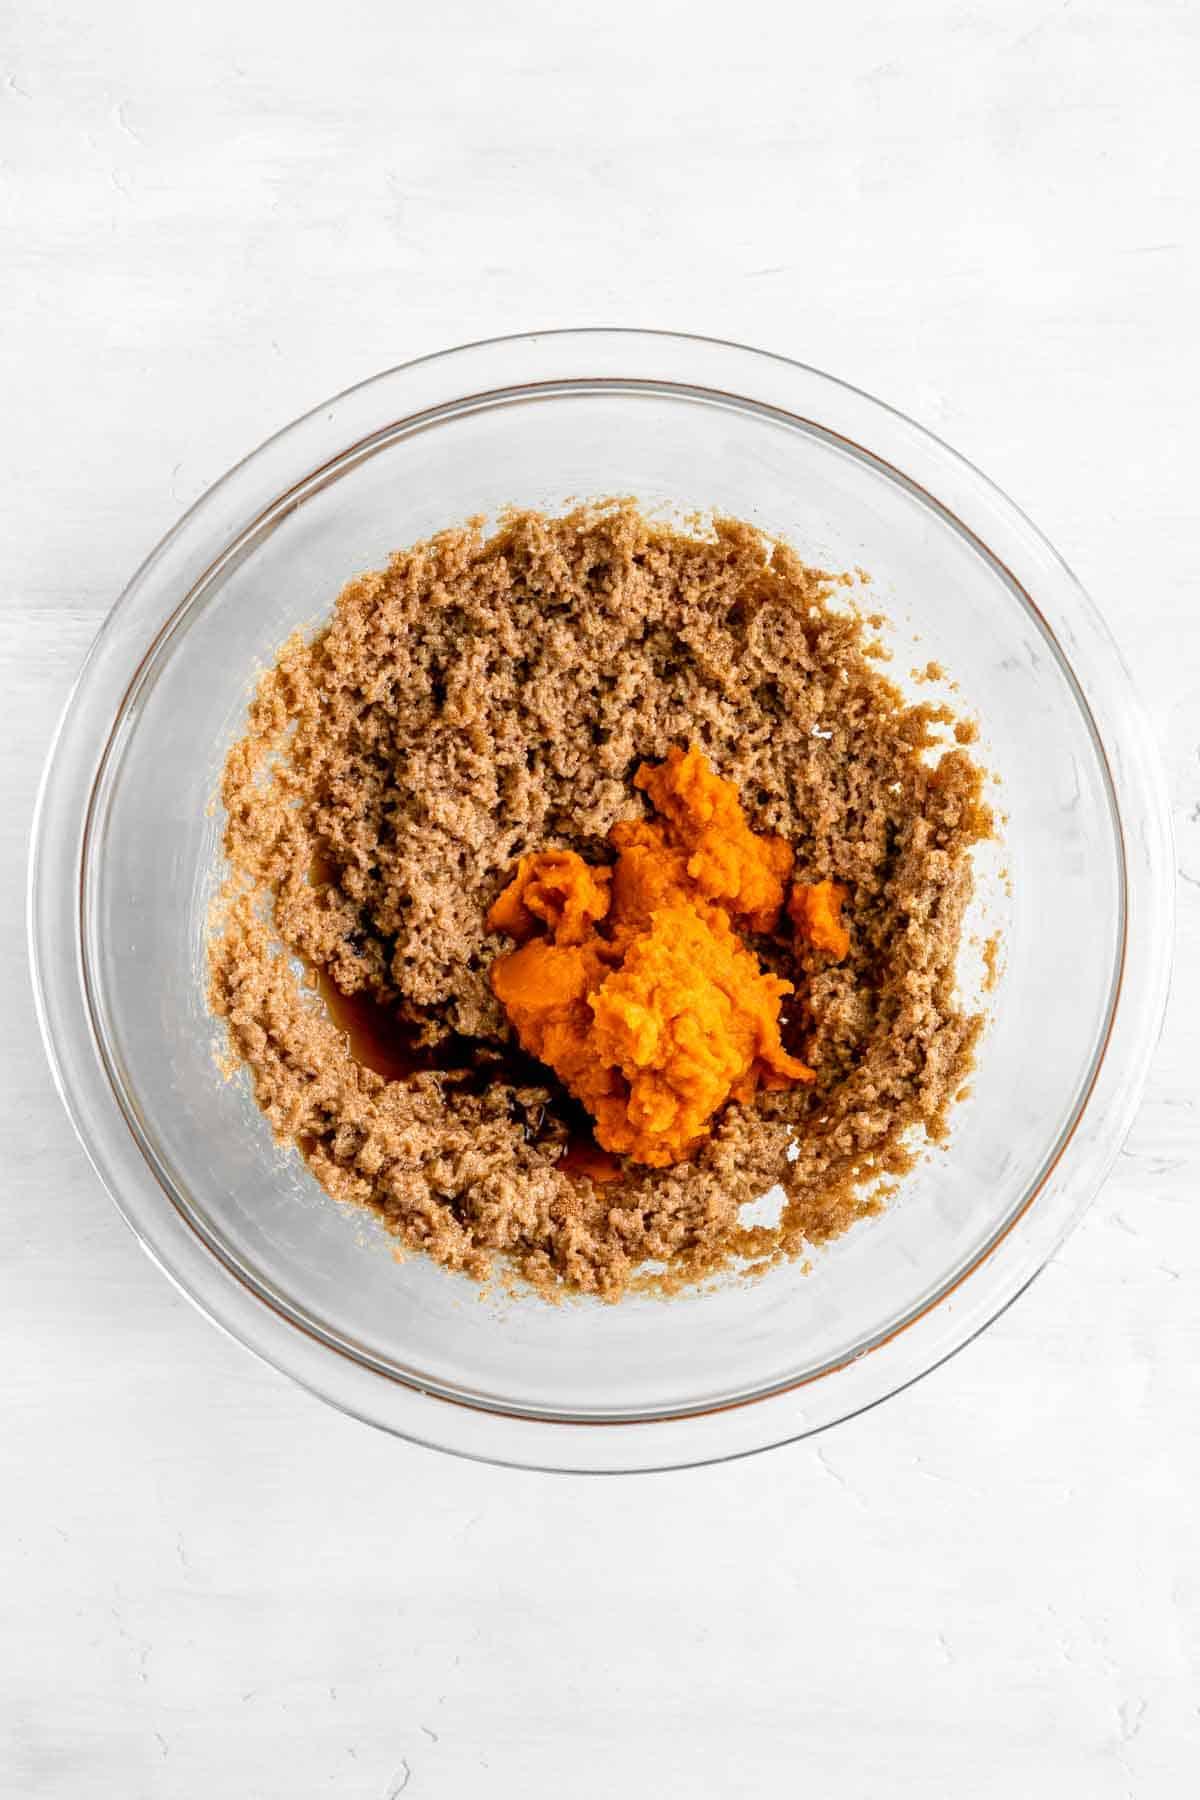 pumpkin puree, brown sugar, white sugar, and vegan butter in a glass bowl